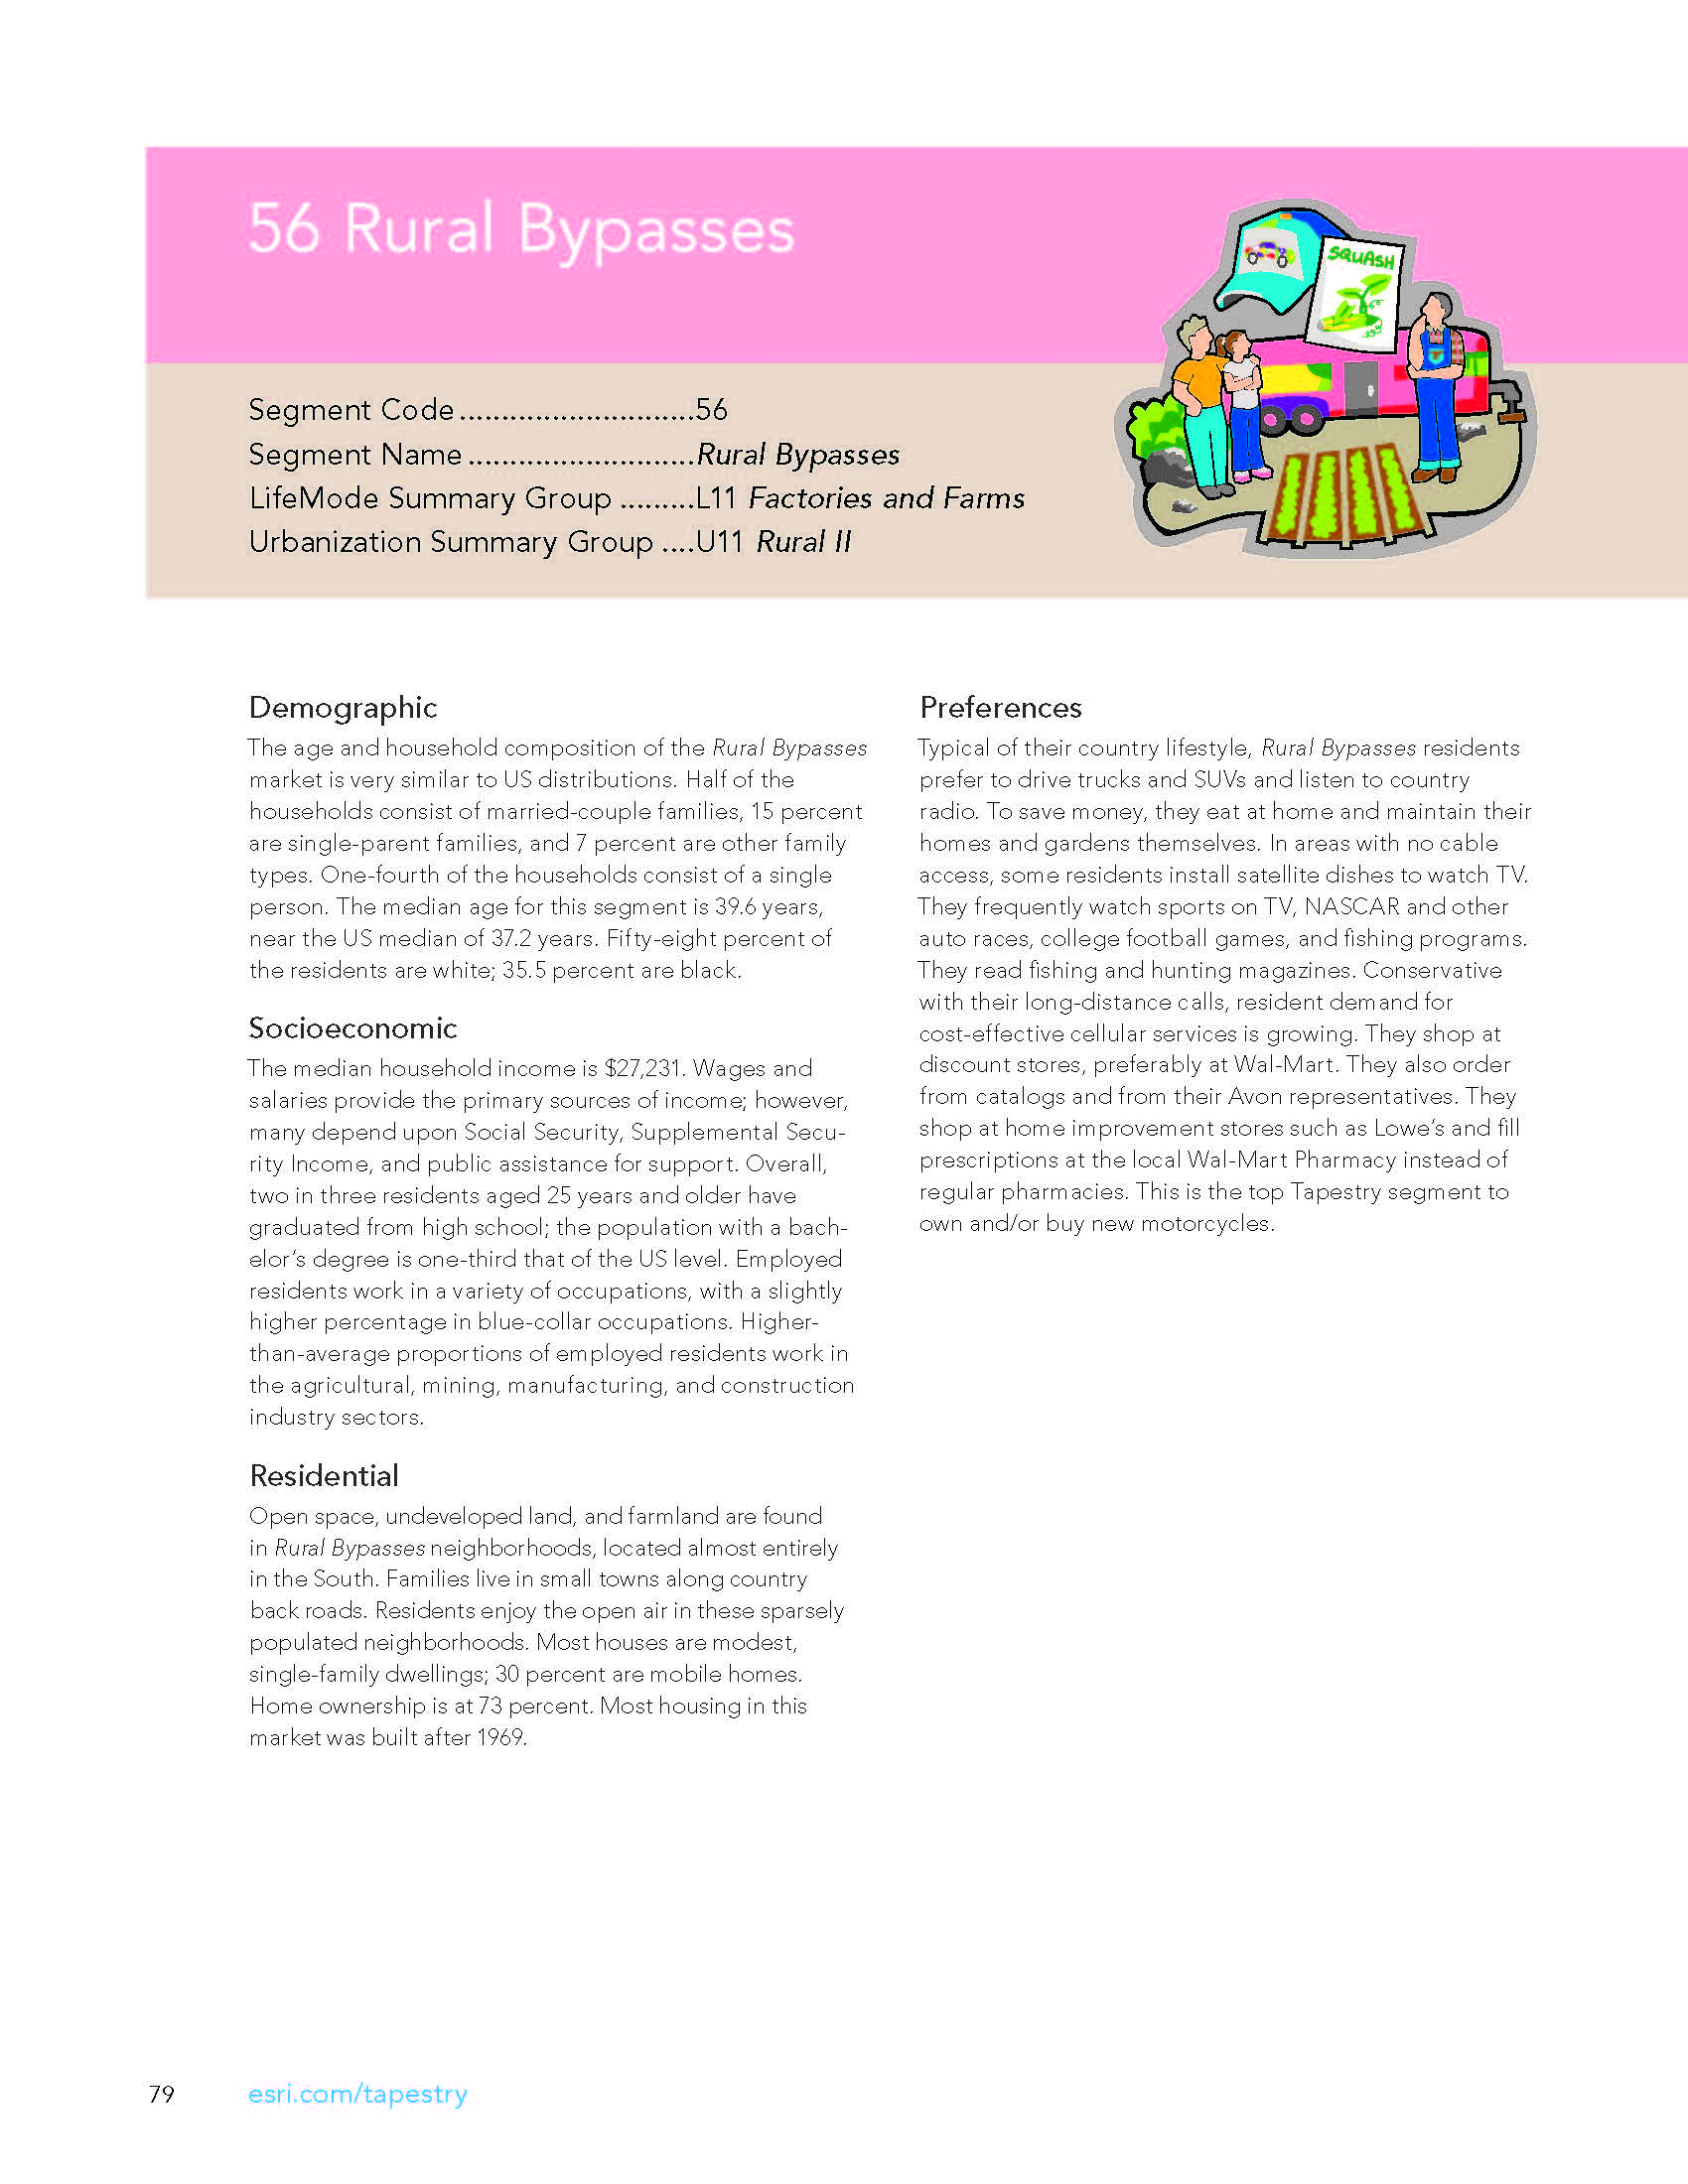 tapestry-segmentation_Page_82.jpg